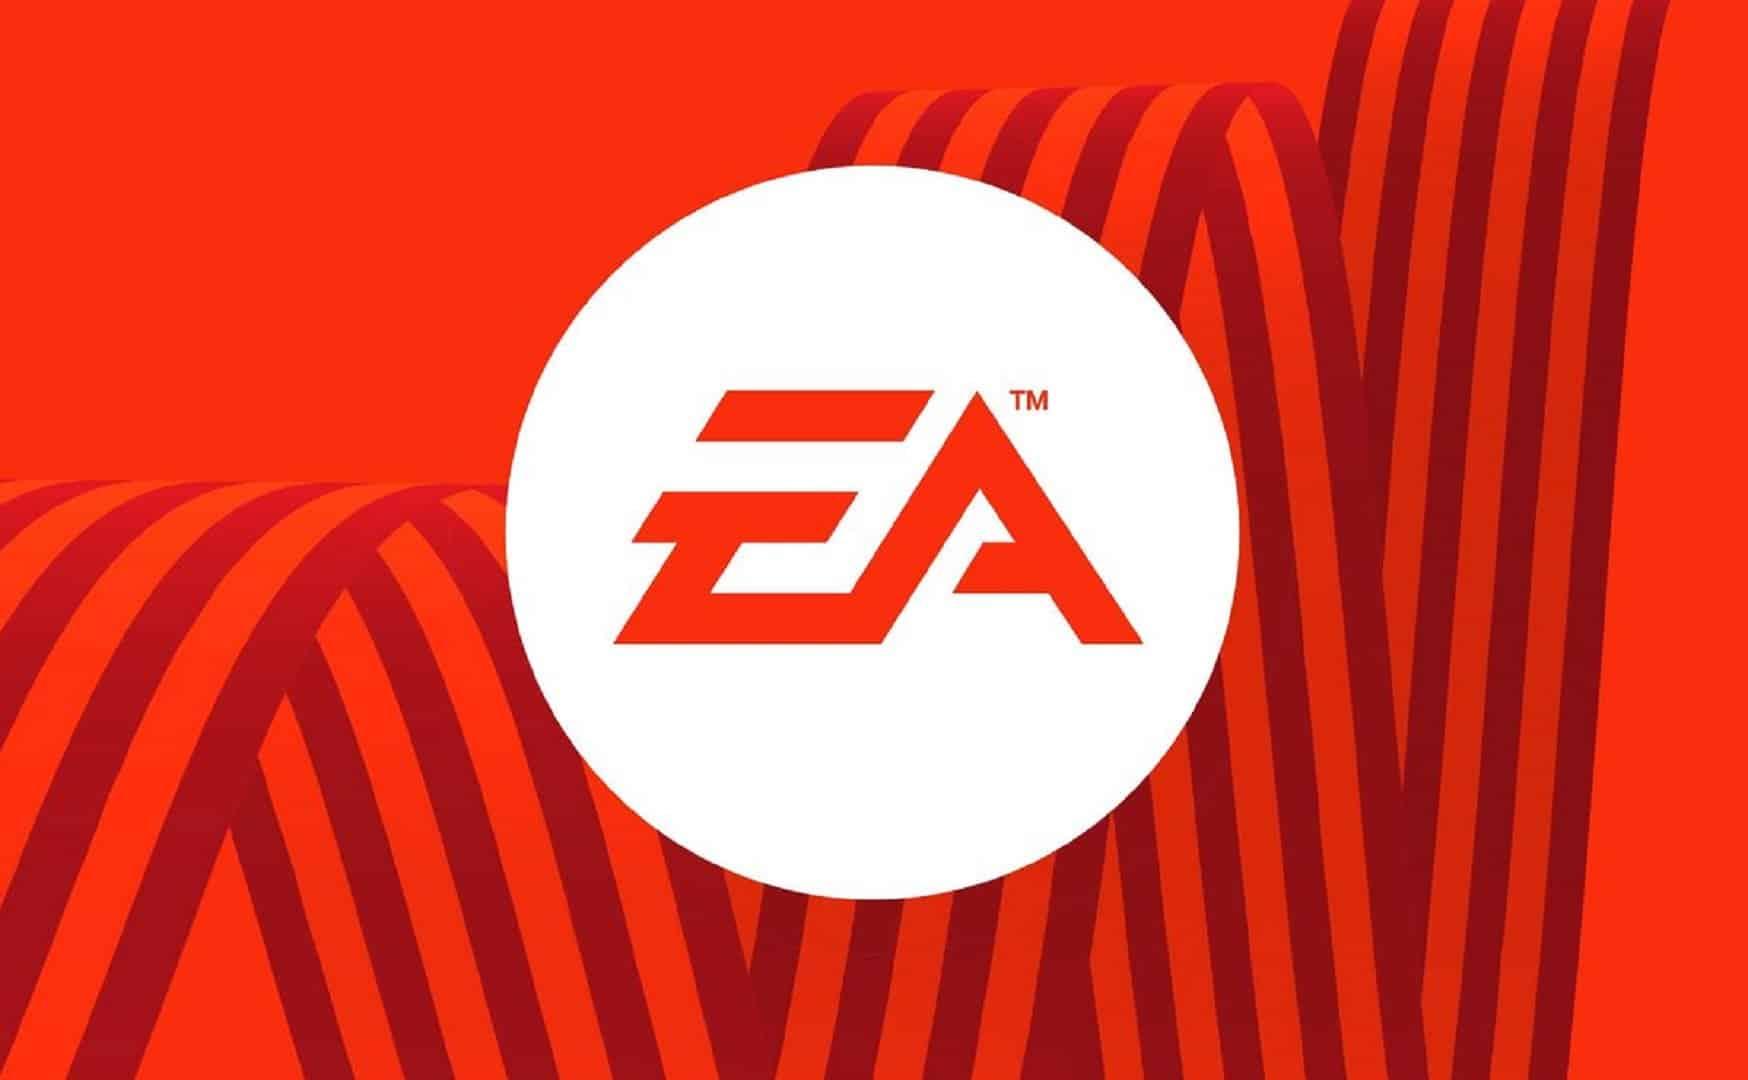 EA Anti-cheat Electronic Arts, anti-cheat